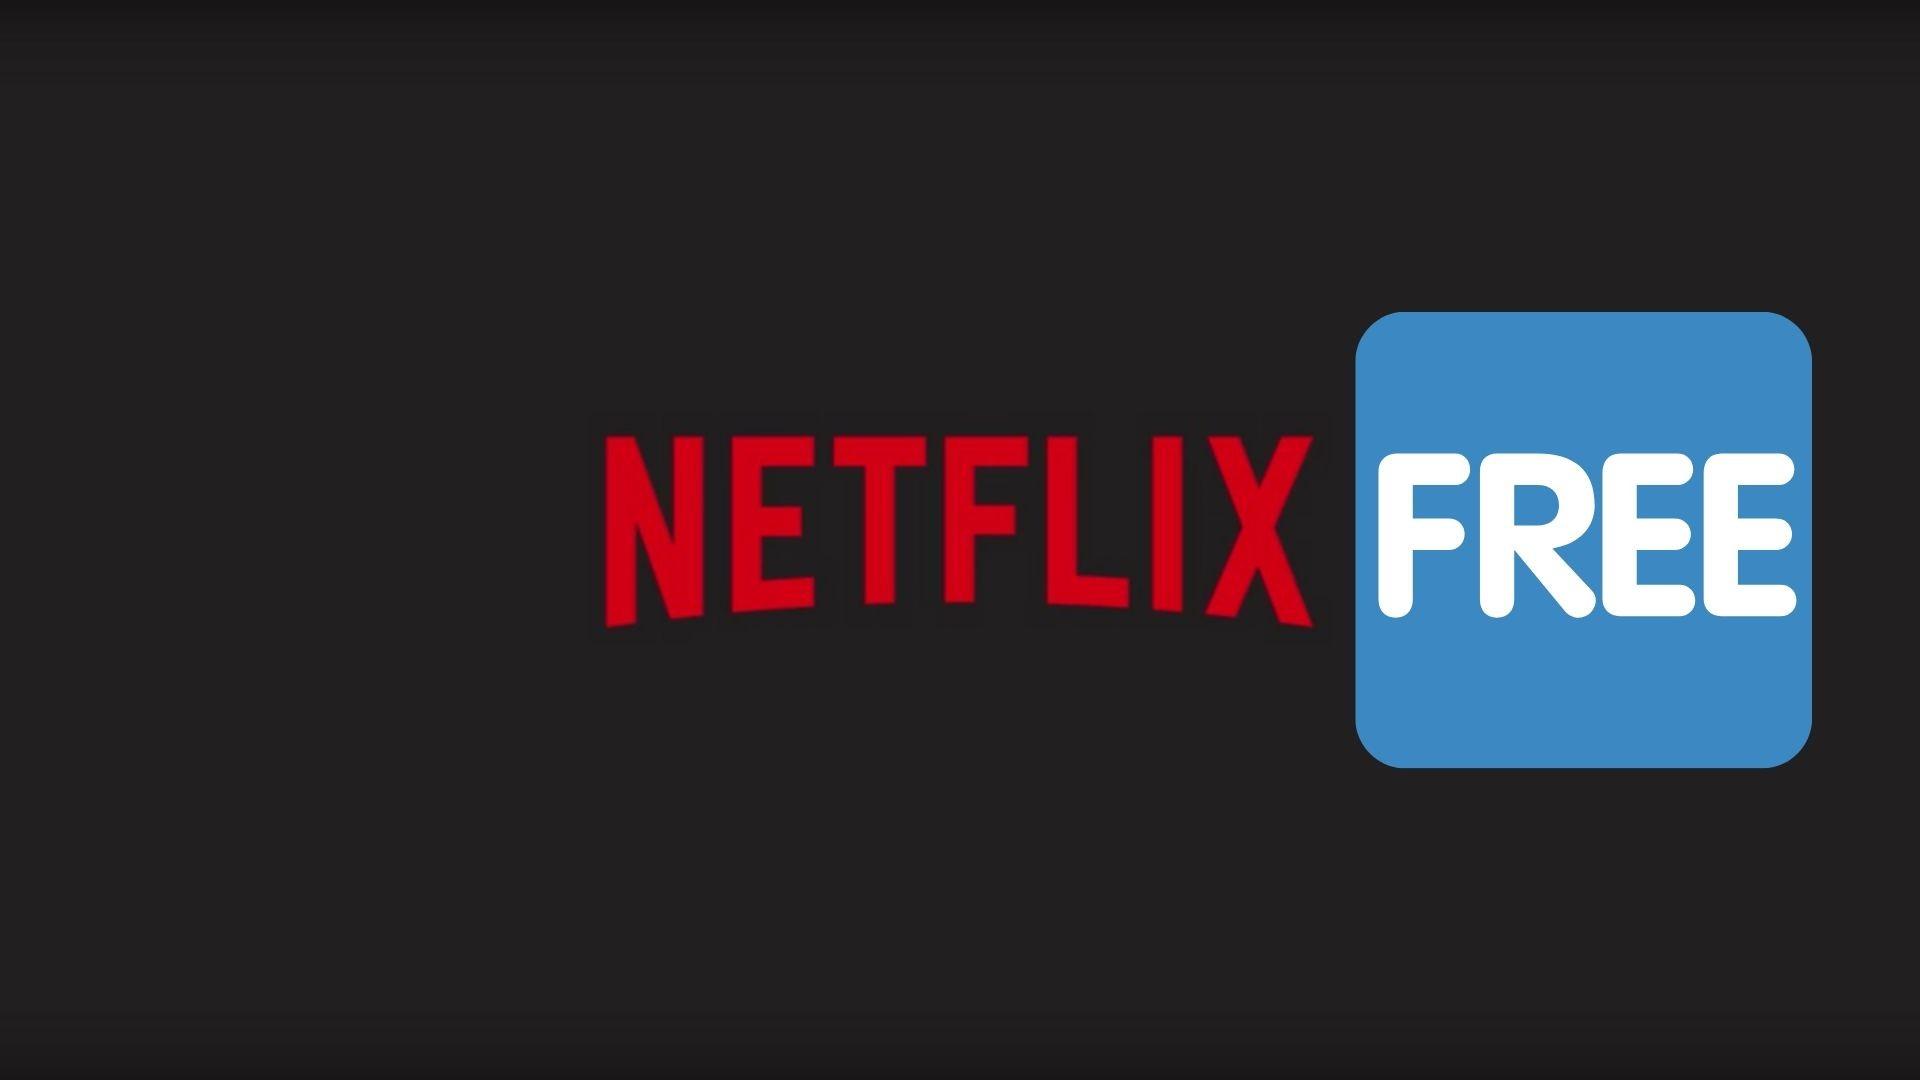 Netflix Alles Kostenlos